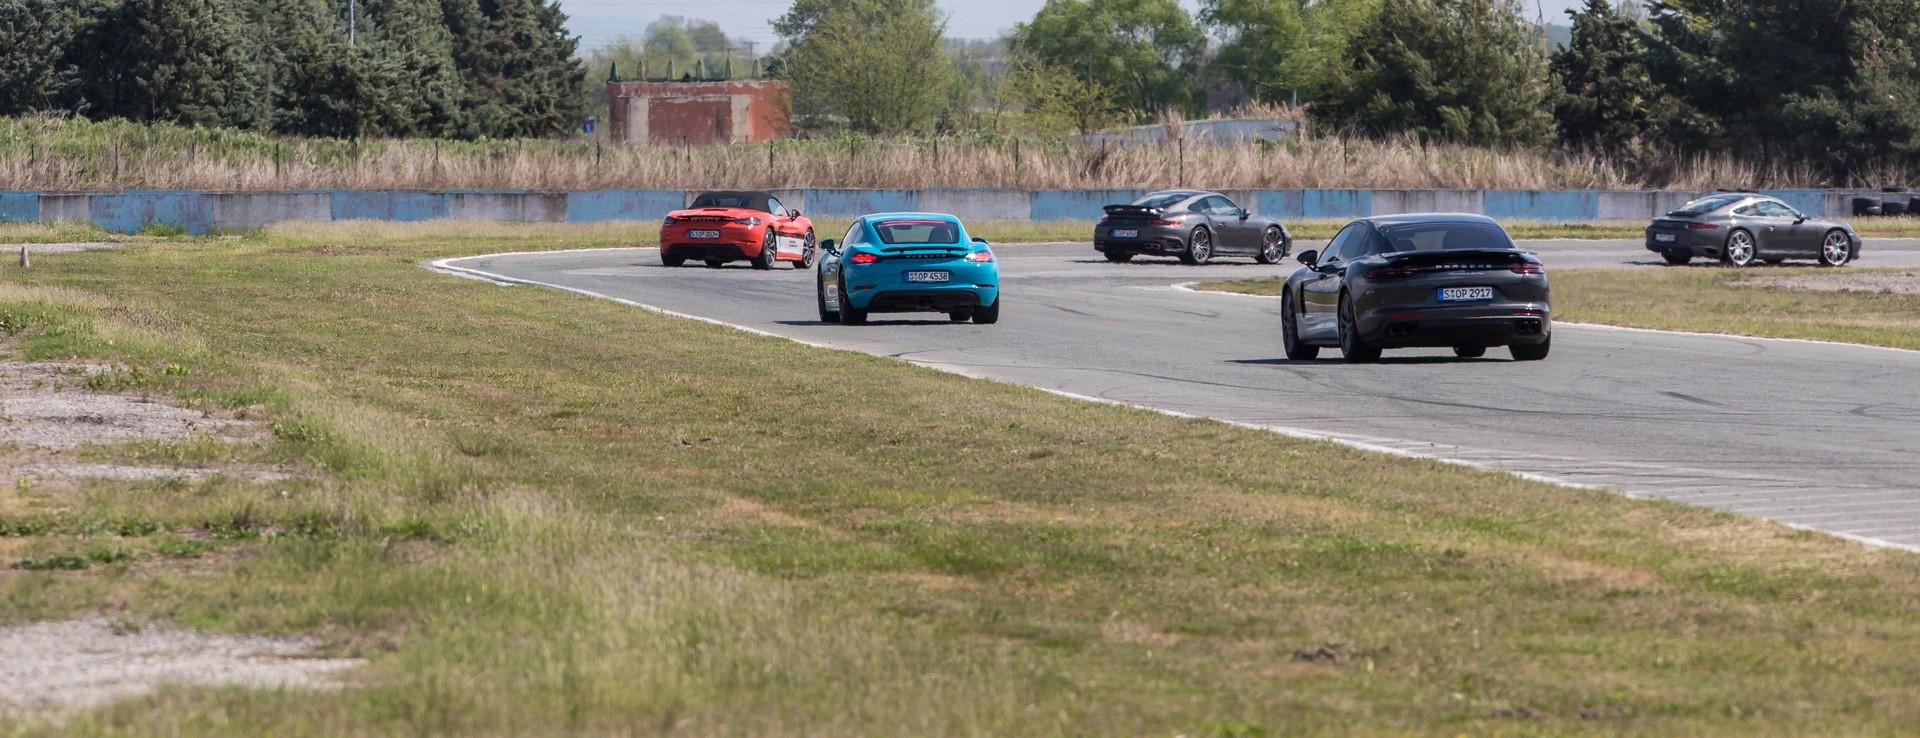 Porsche Driving Experience 2017 Serres (95)